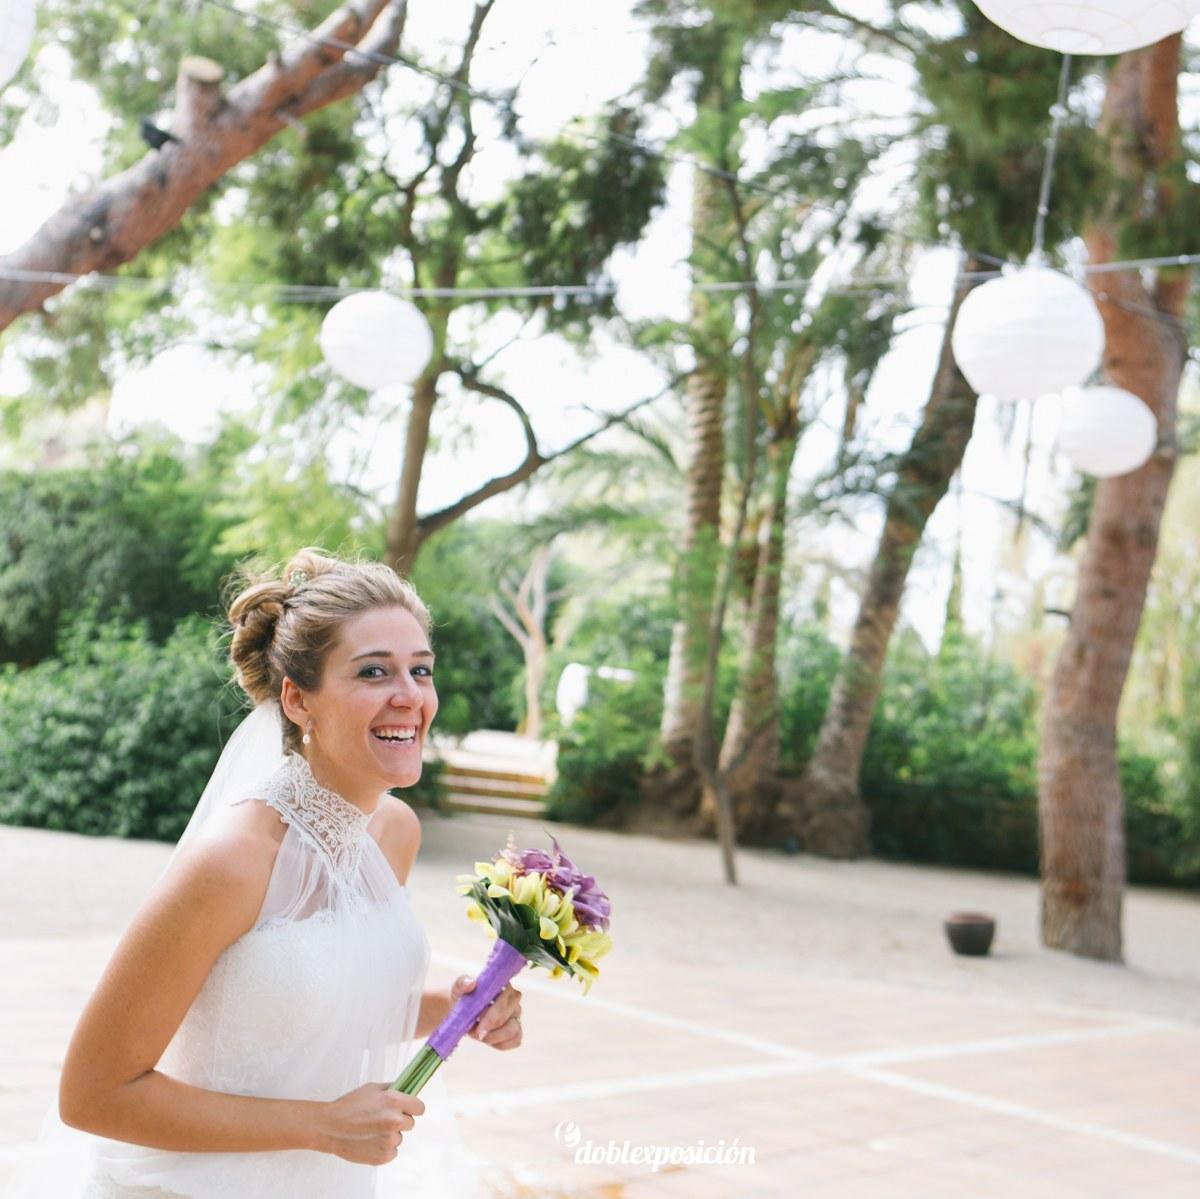 fotografos-boda-finca-jardines-de-abril-alicante_0022